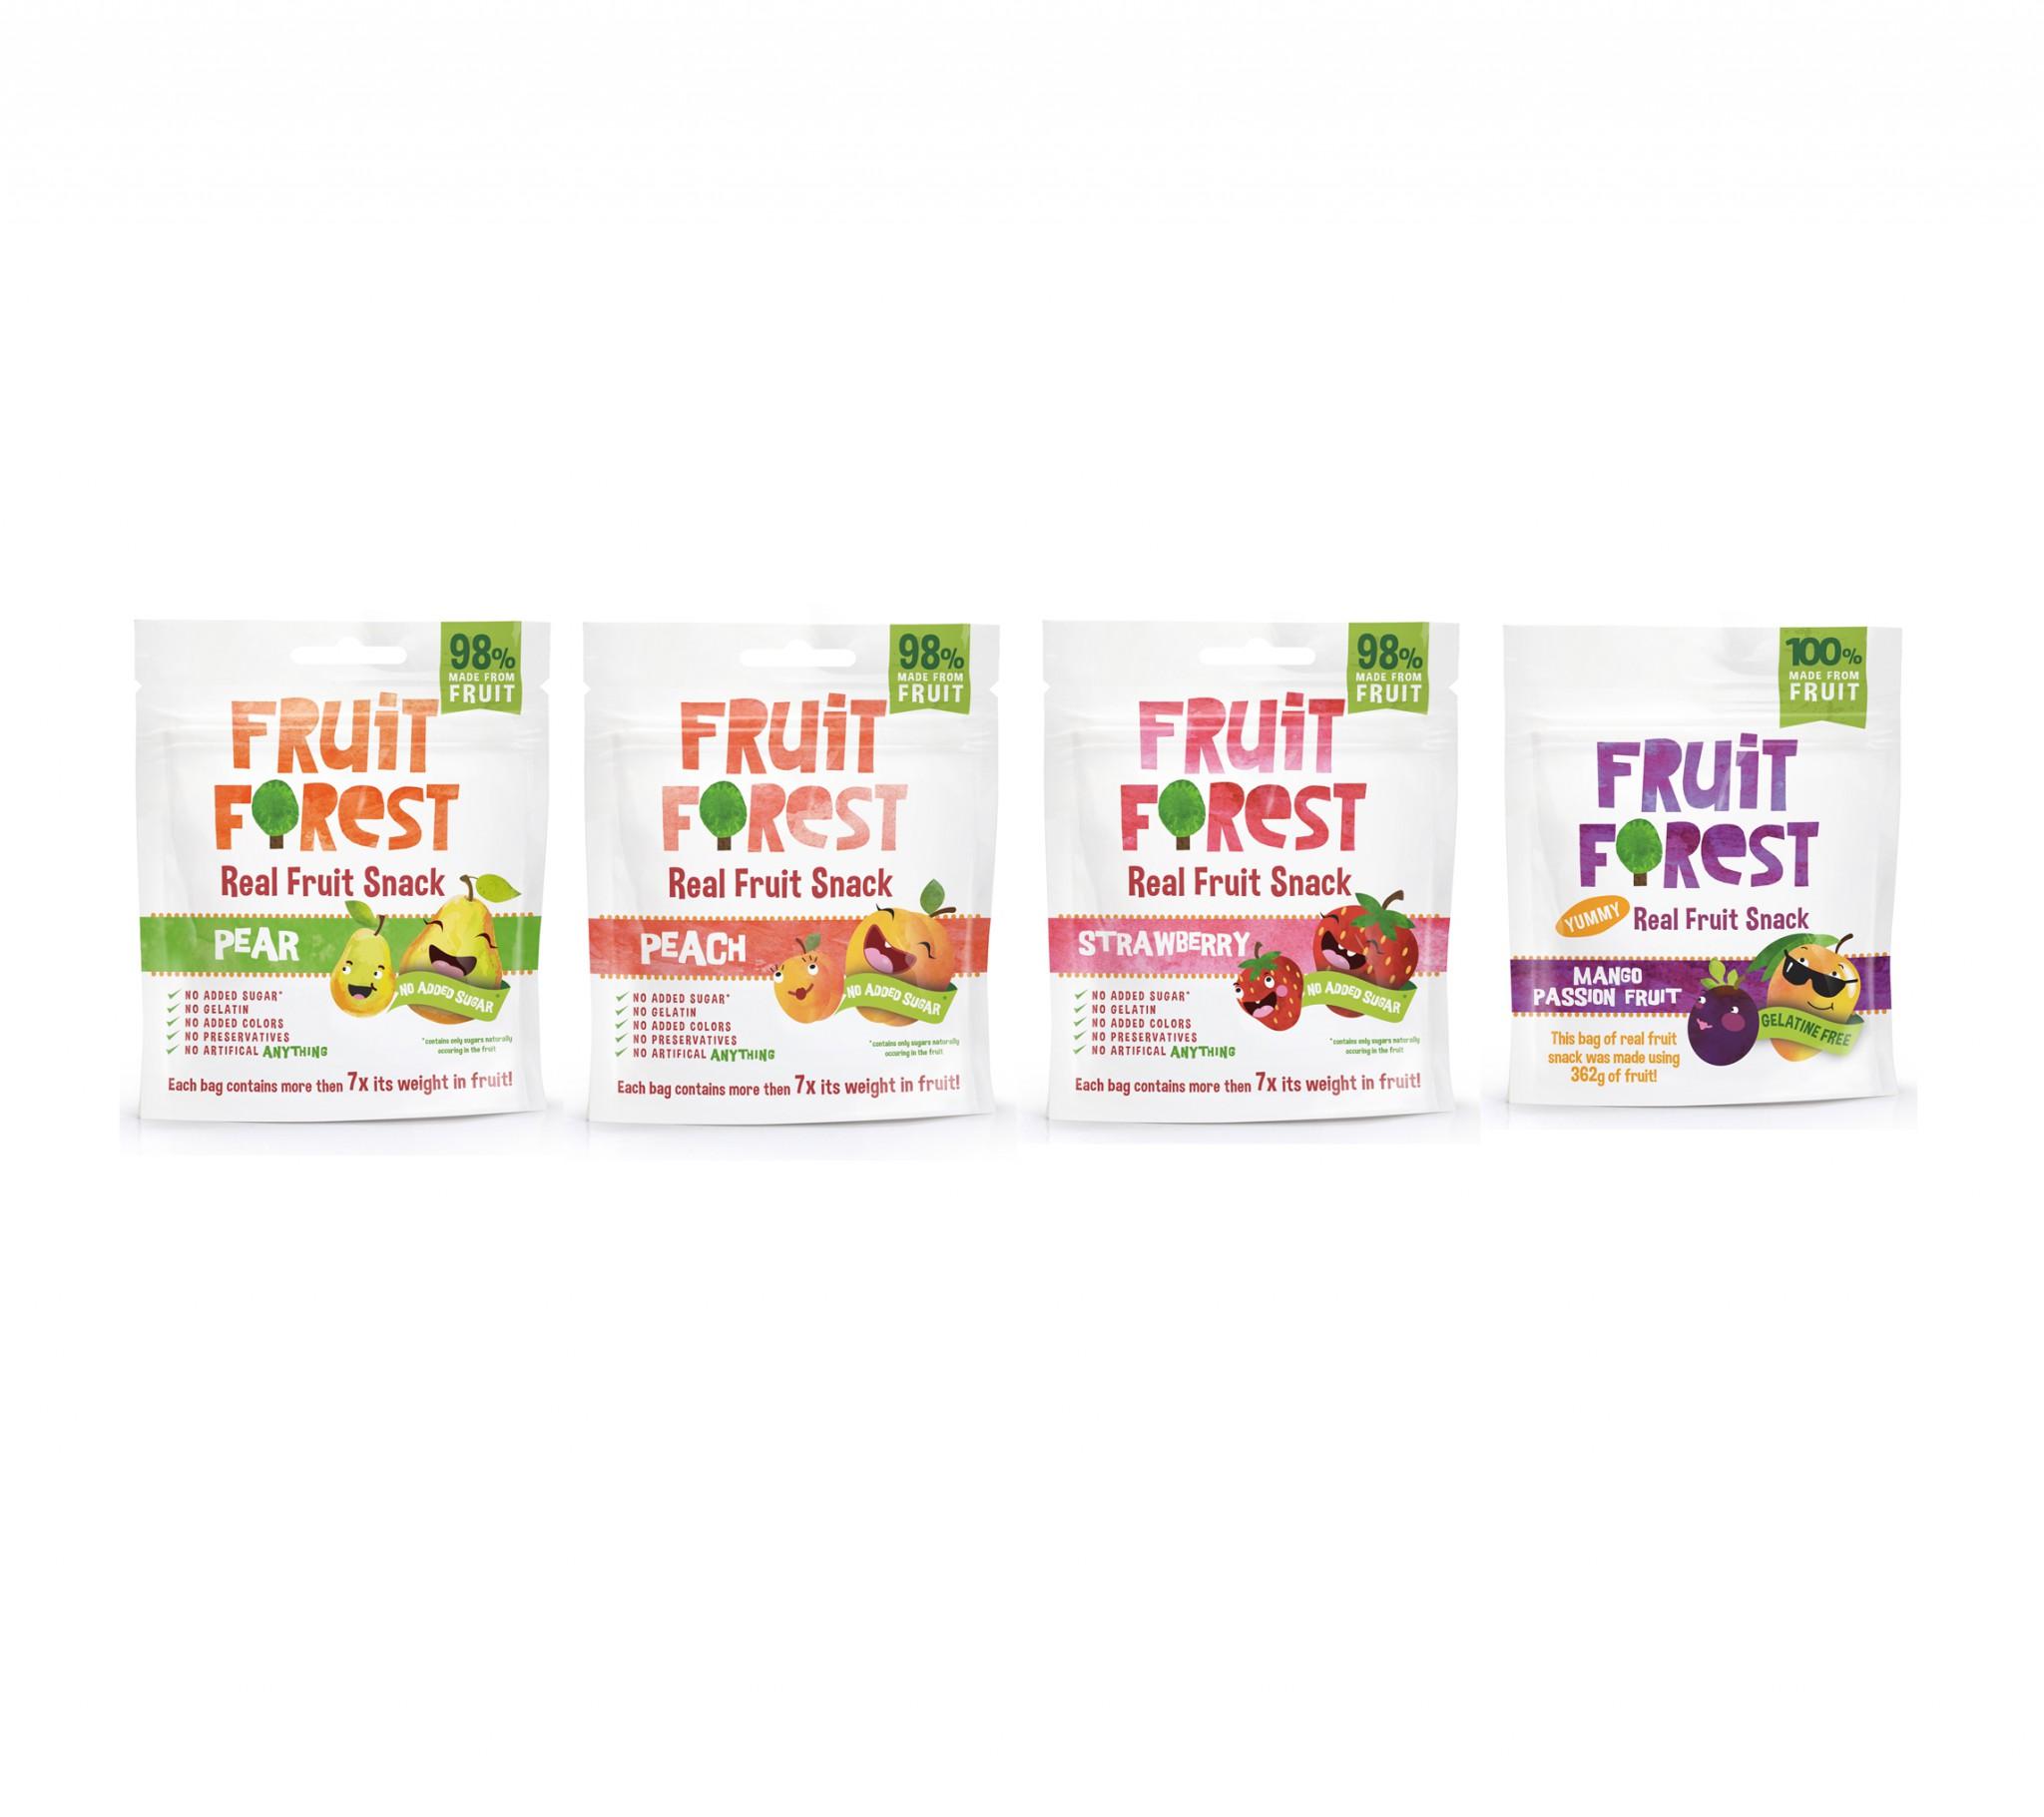 Snack de fruits (98% de fruits)